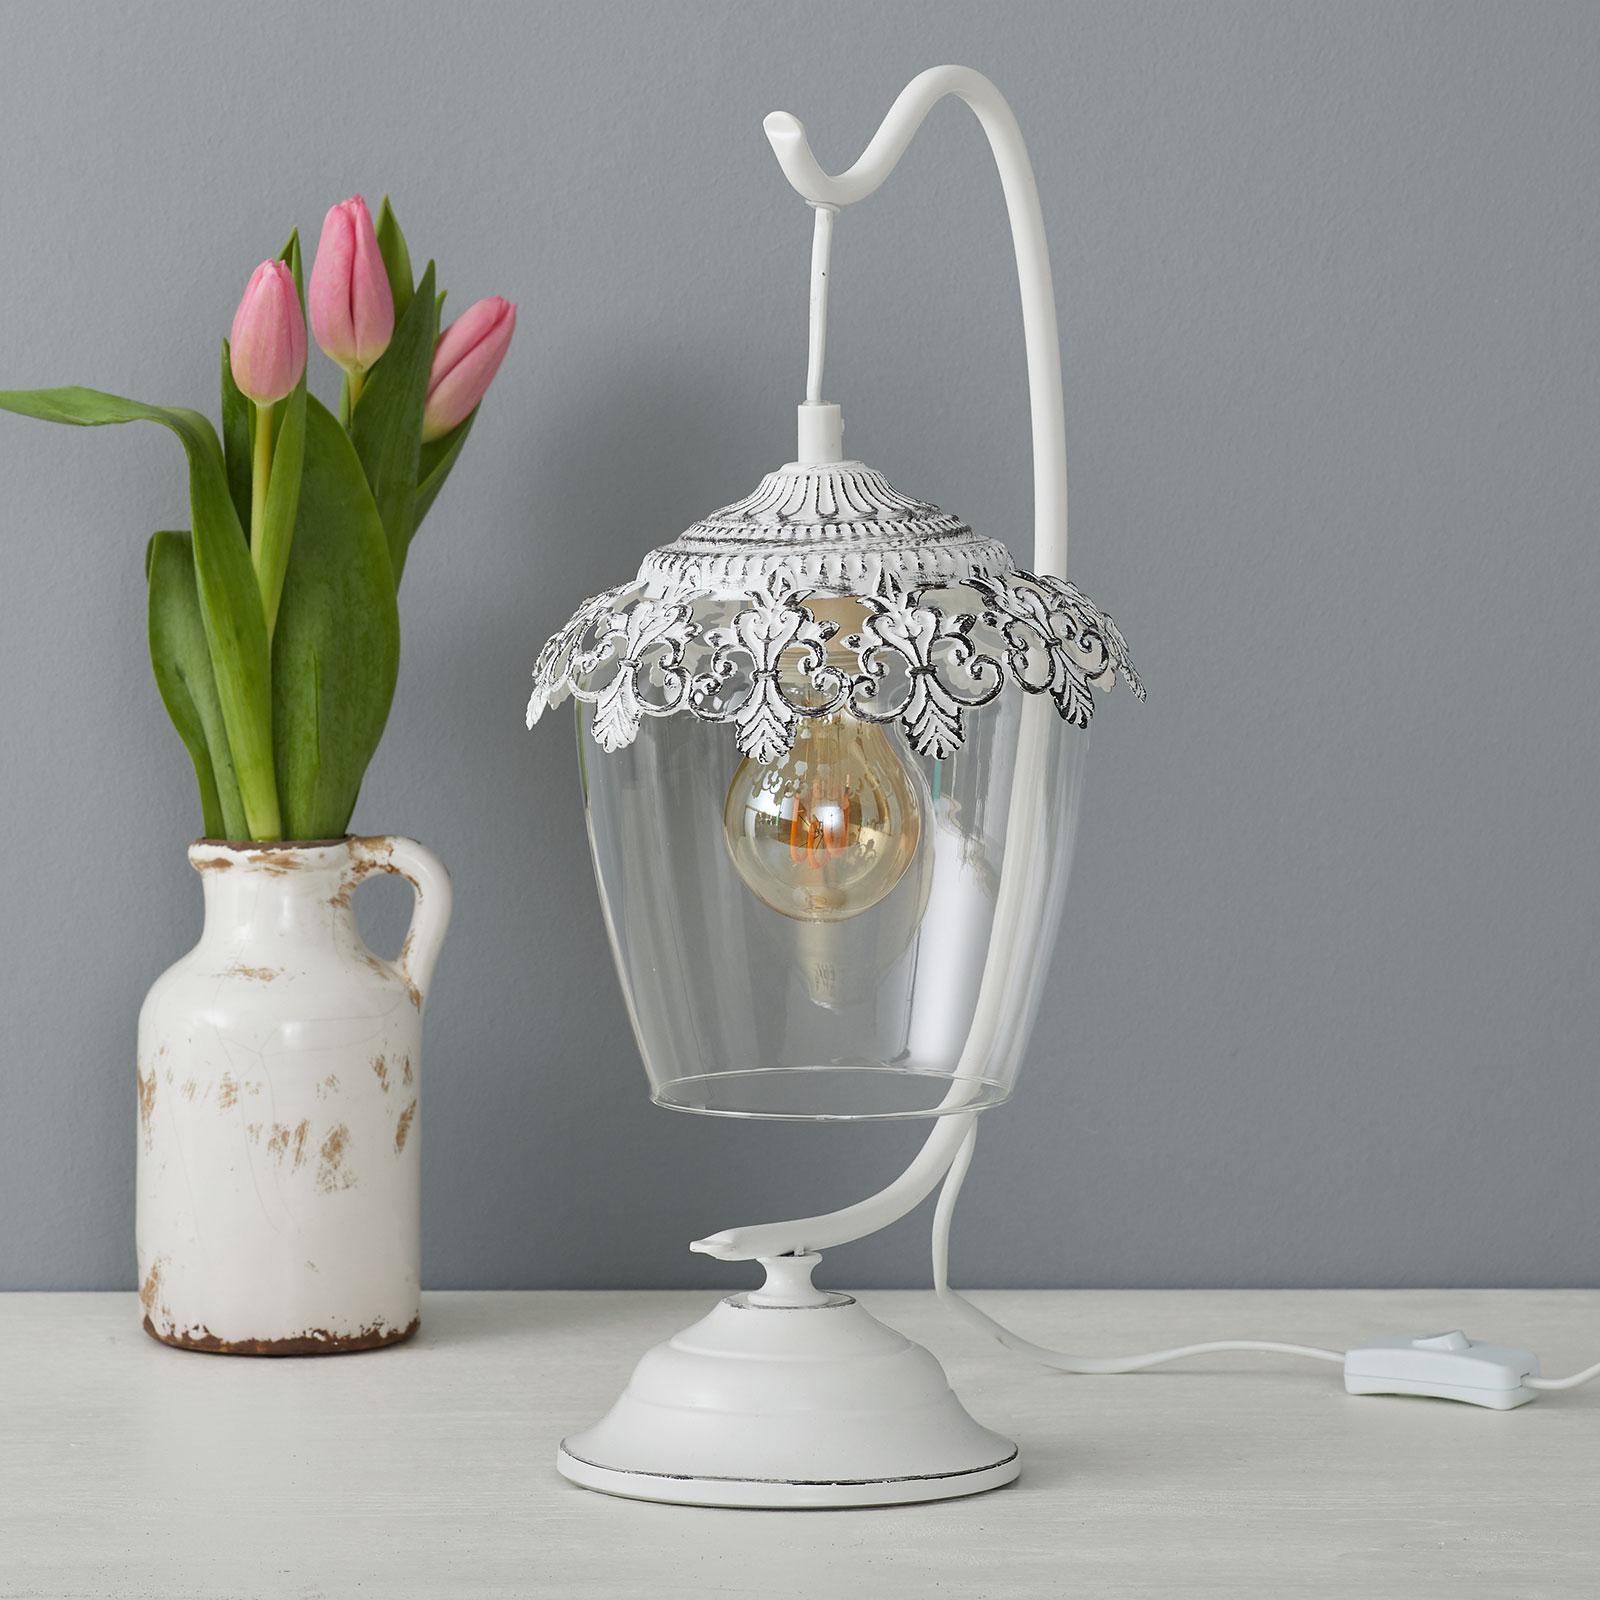 Bielo patinovaná stolná lampa Florinia_3031593_1